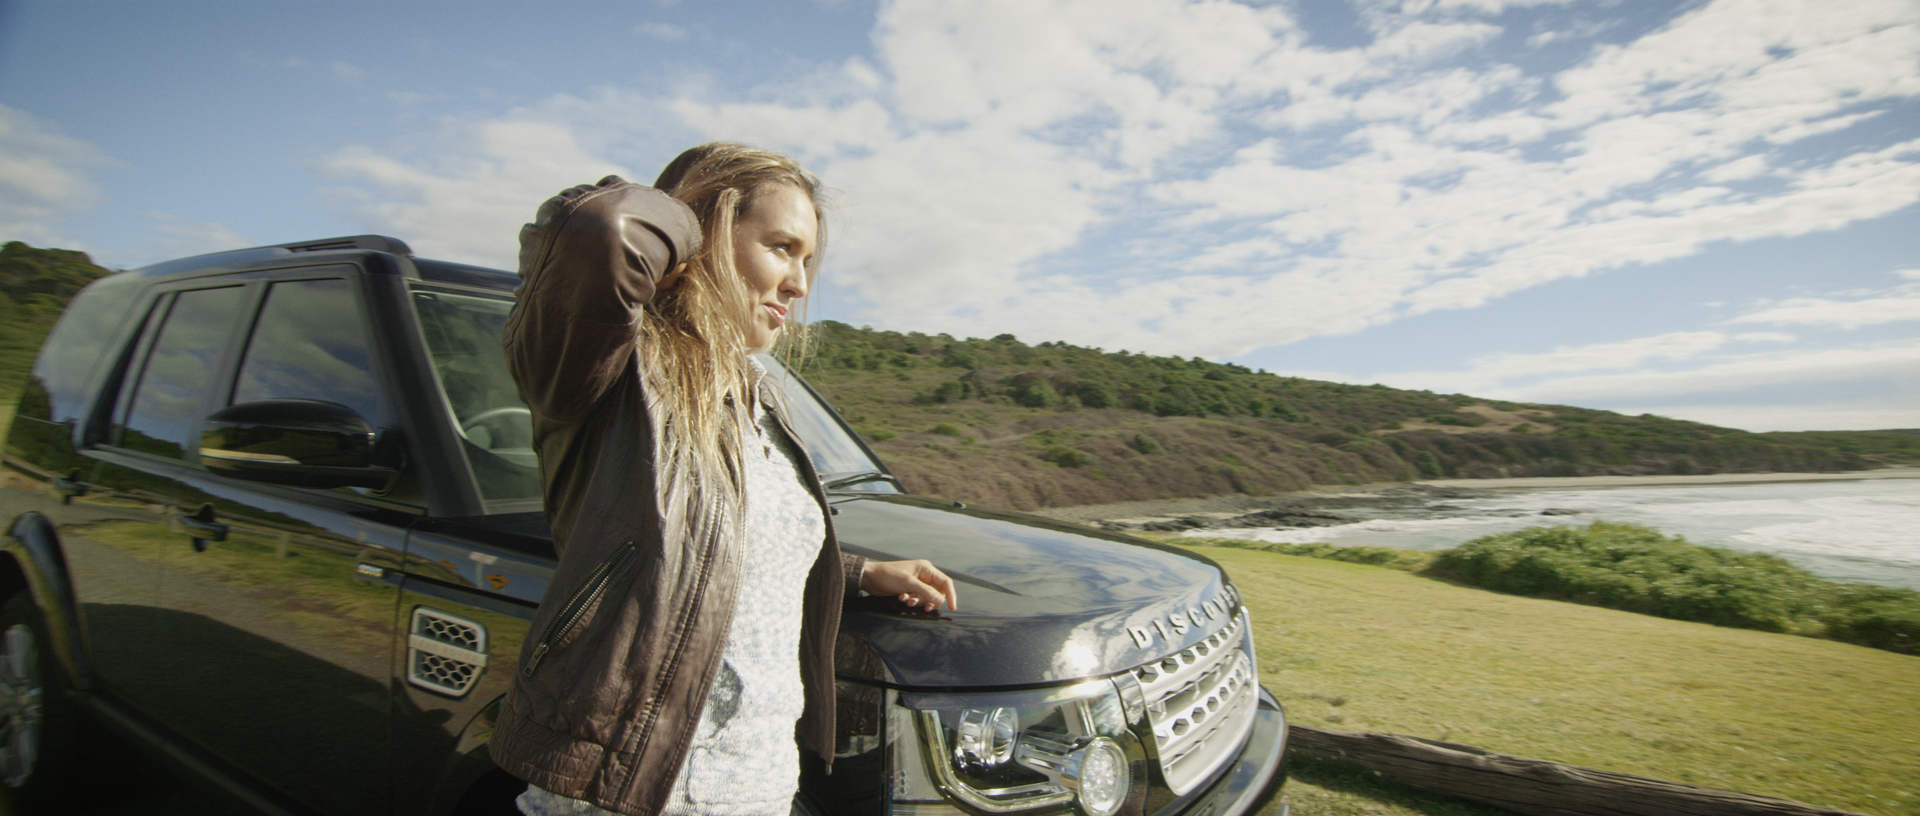 Land_Rover_Sally_Fitzgibbons_05.jpg